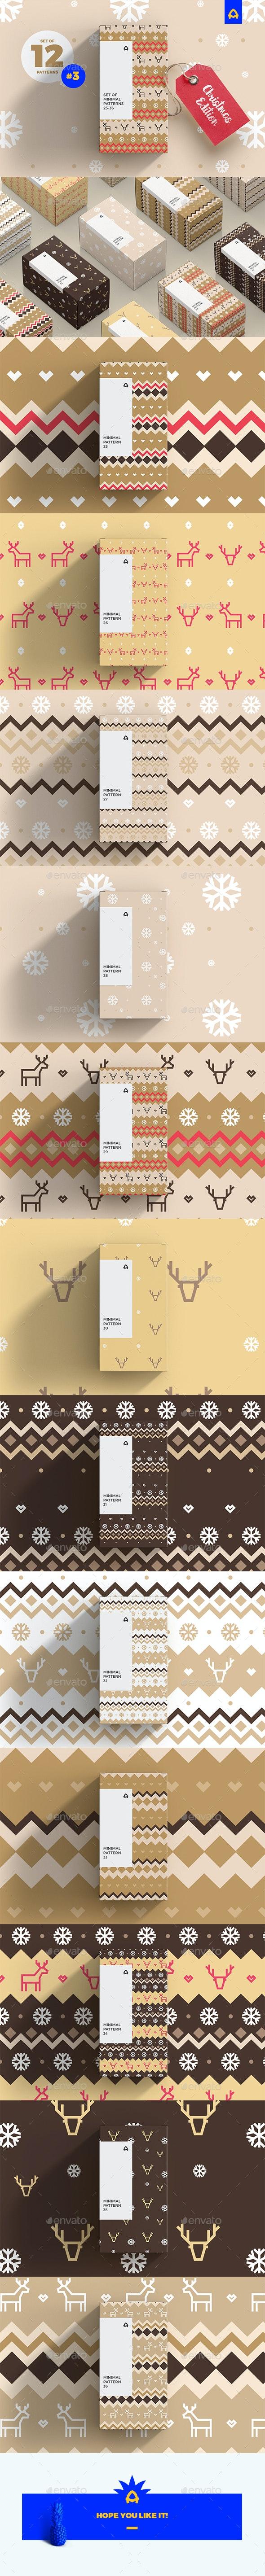 Set of Minimal Christmas Pattern - Patterns Backgrounds